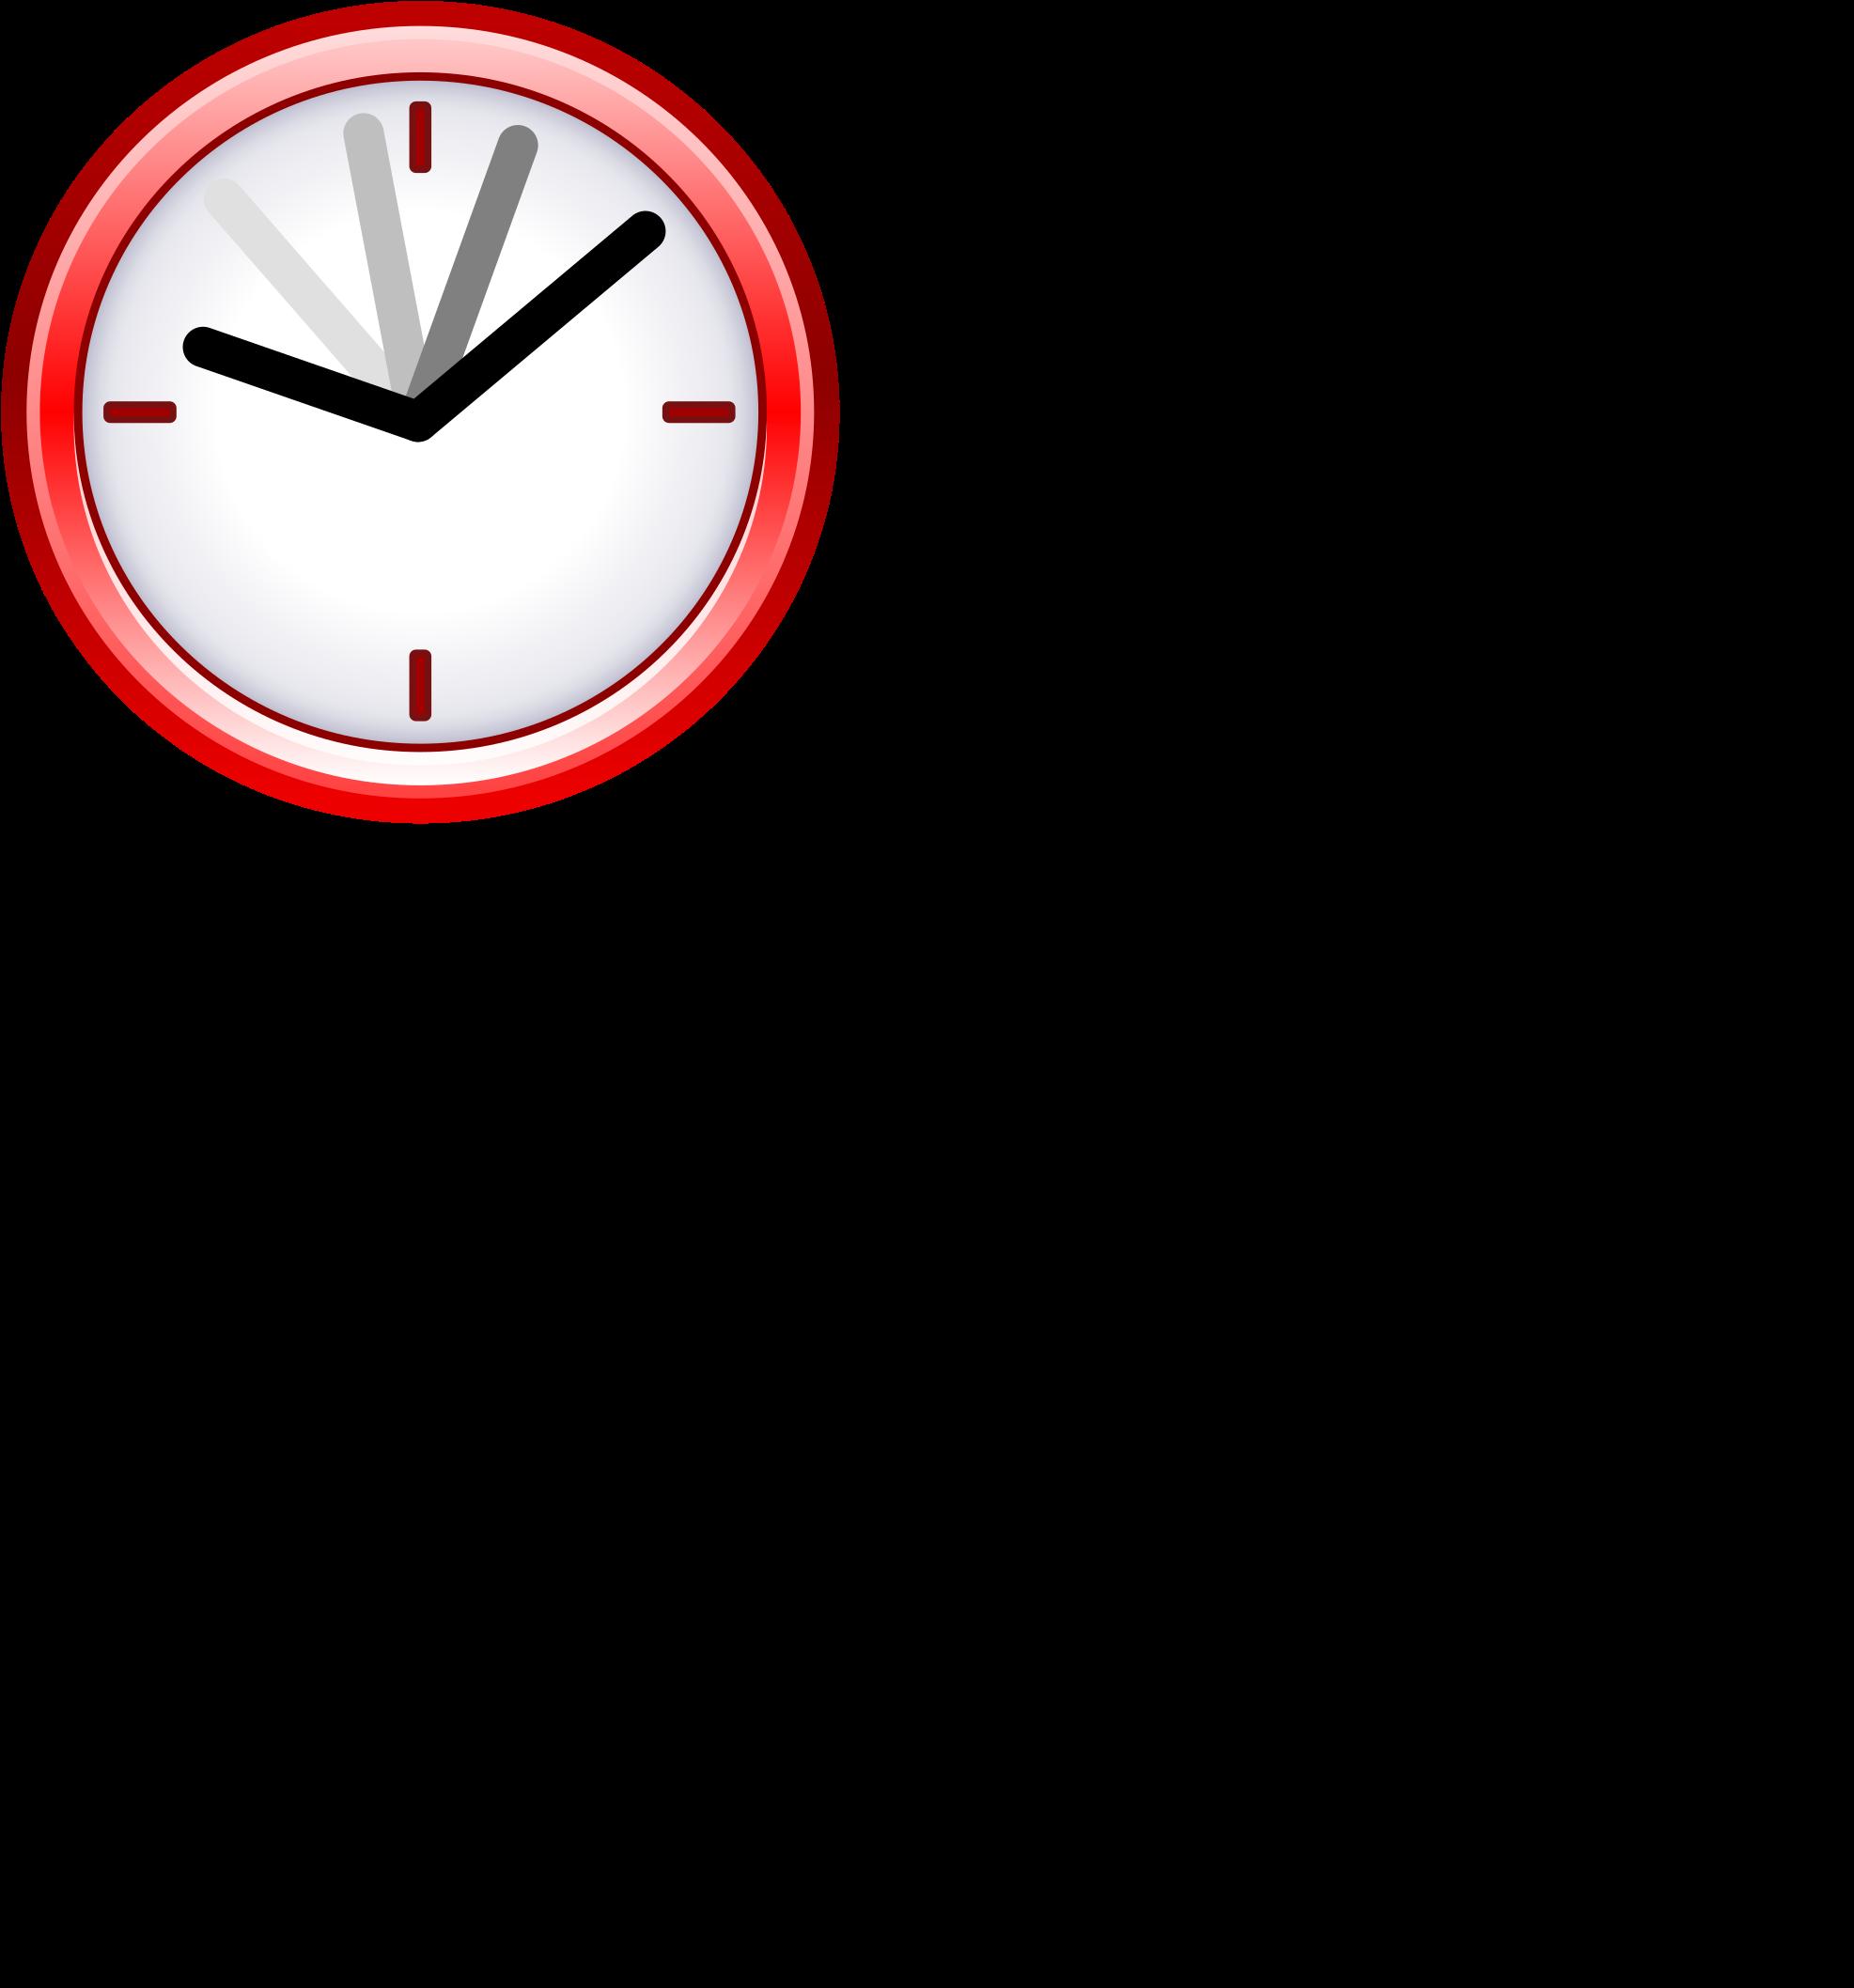 Image Black And White Download Clock Svg Pictogram.